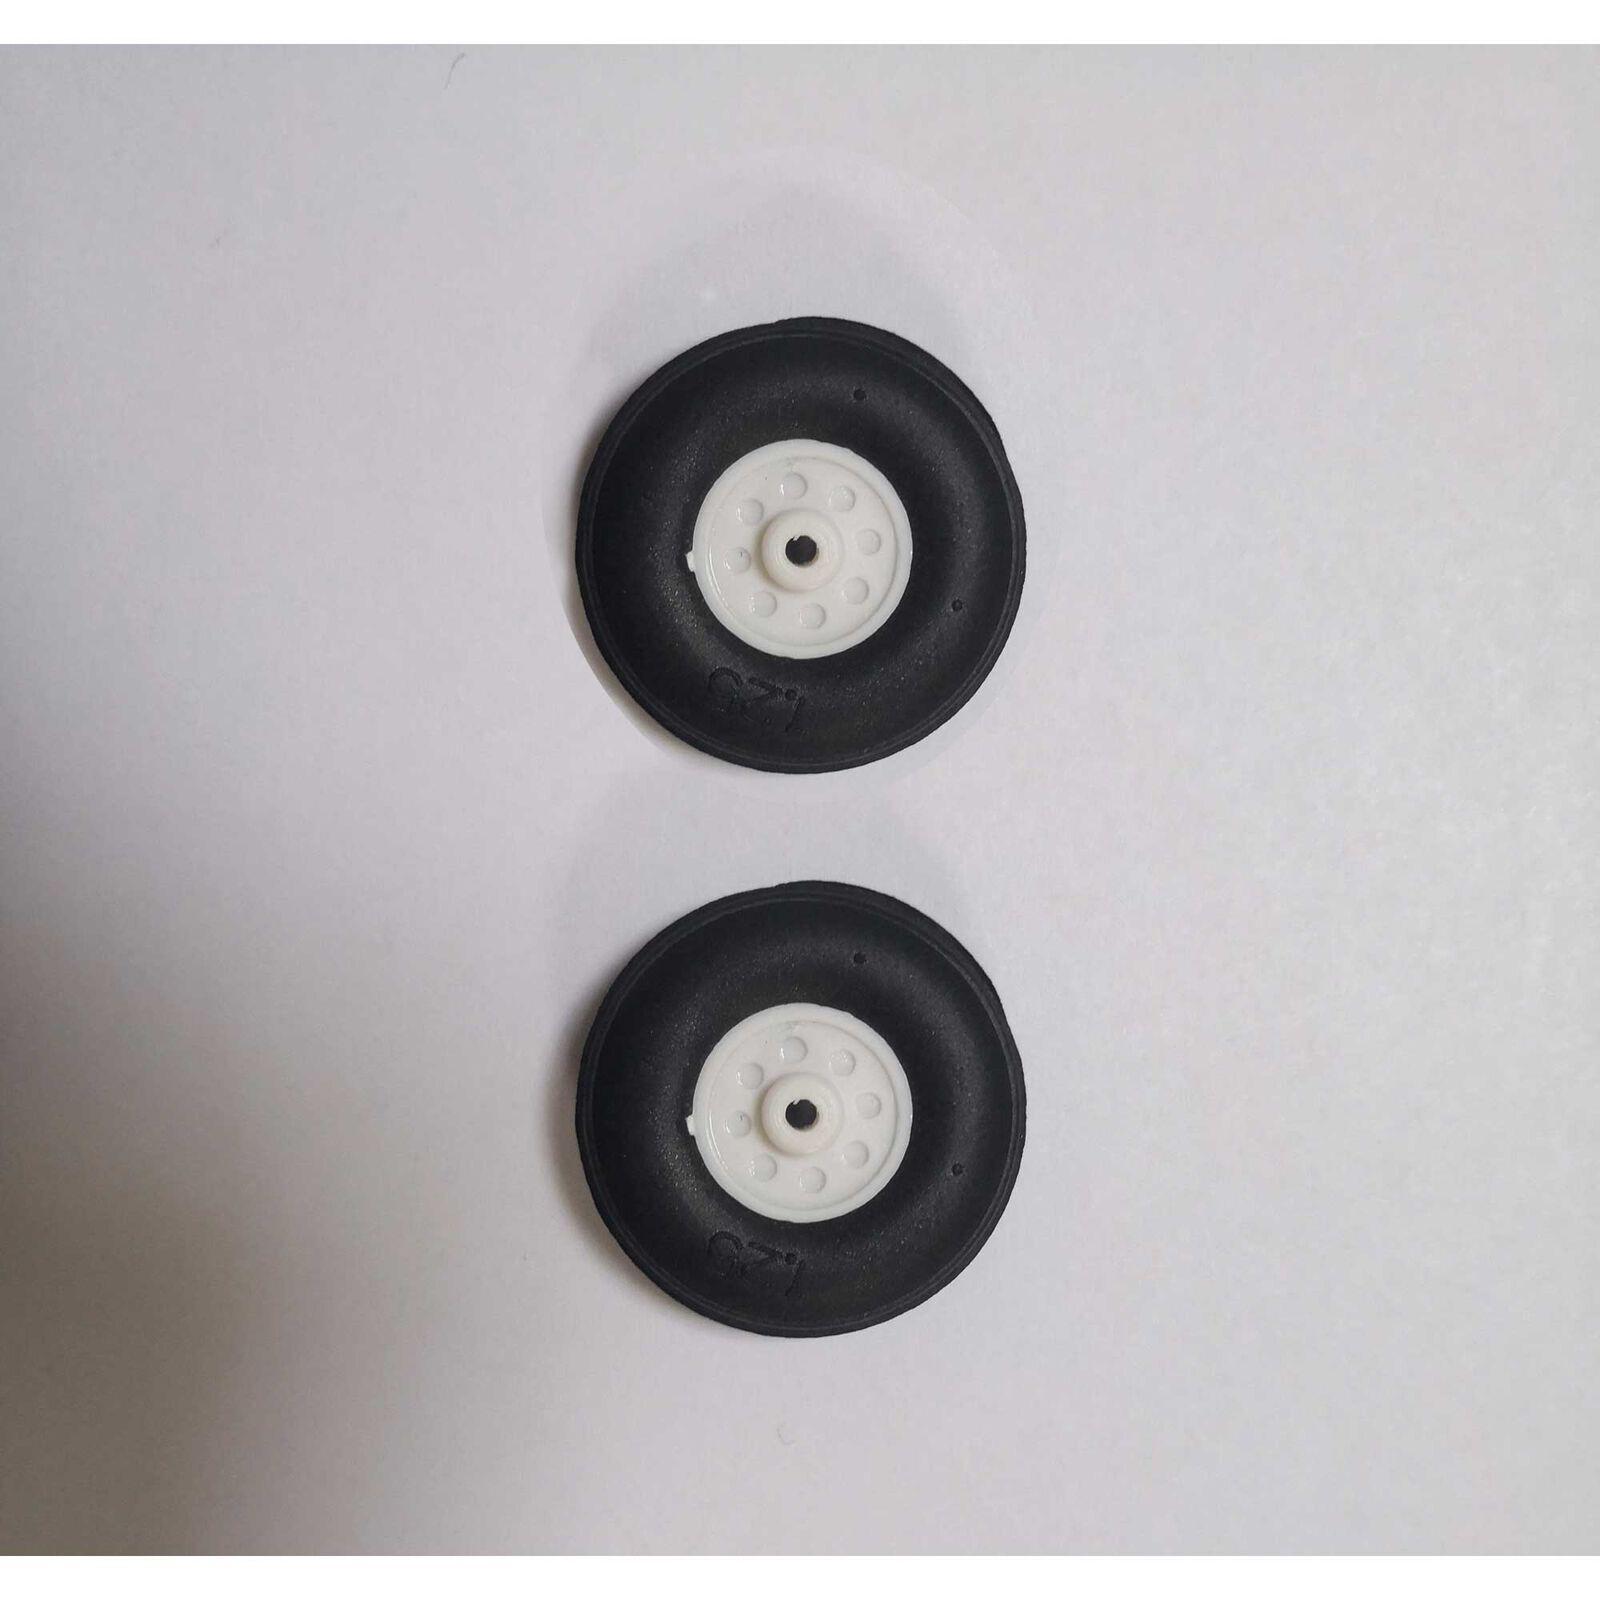 Wheel Set: Edge 540 750mm